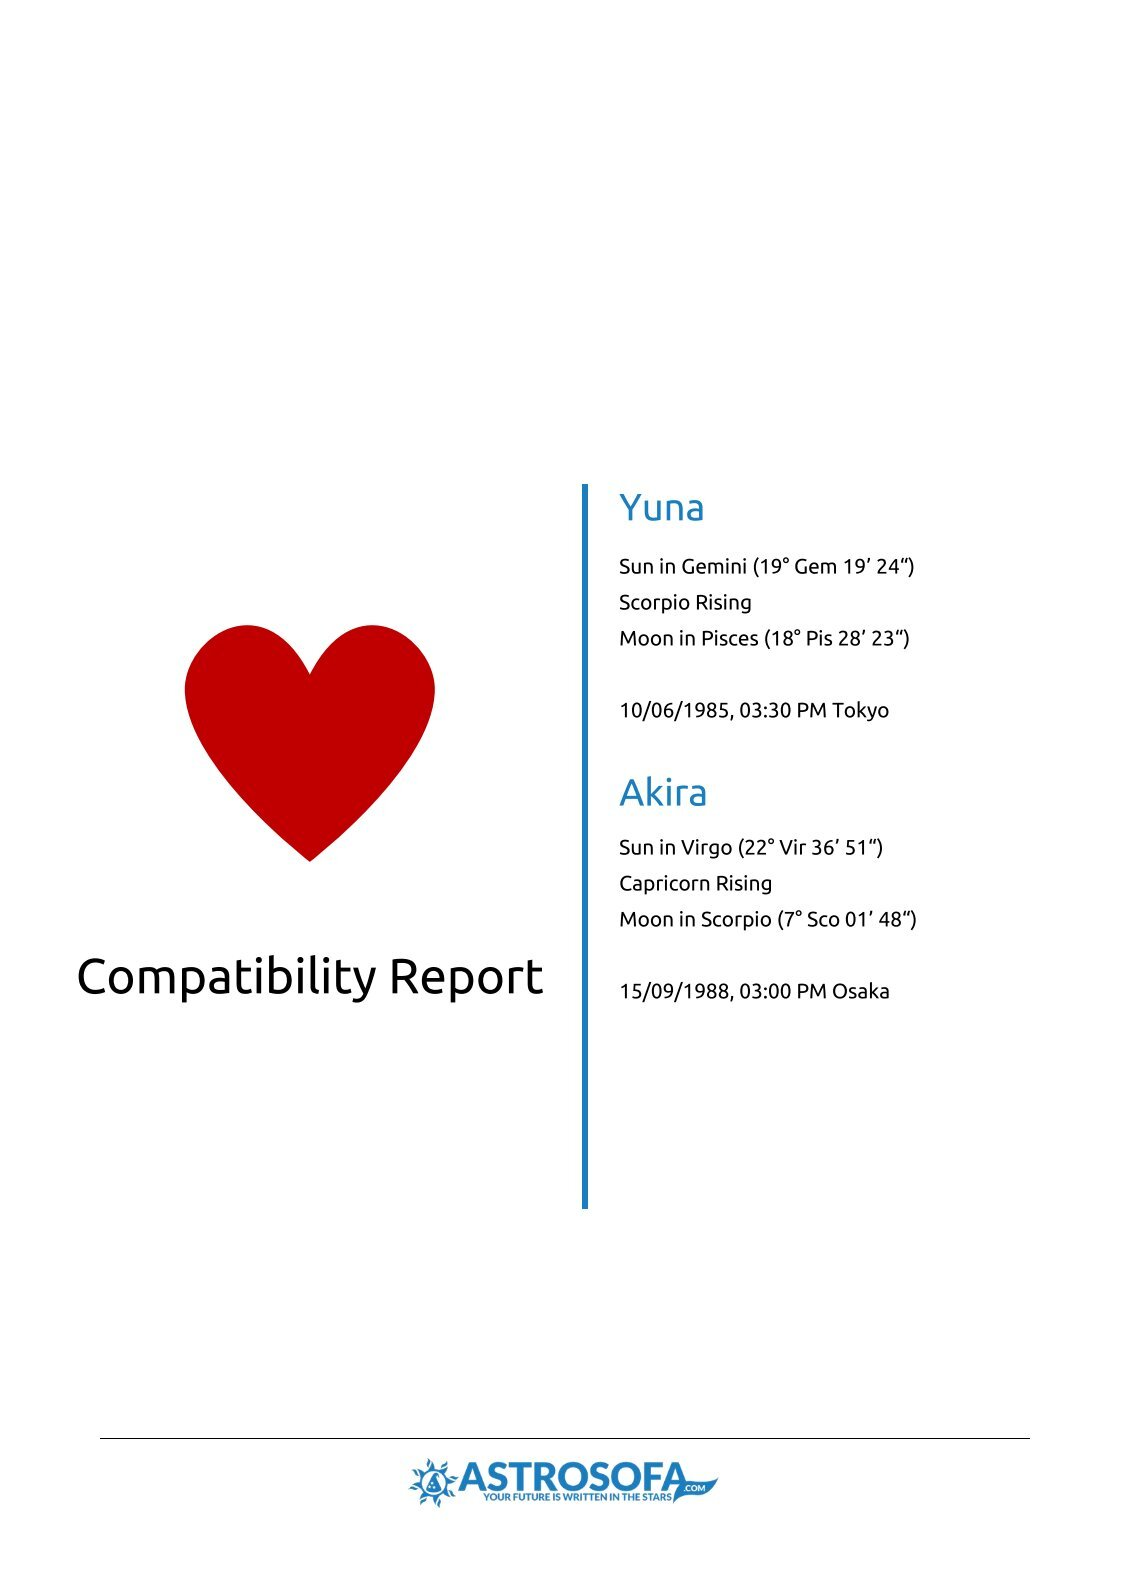 Compatibility Report Yuna and Akira